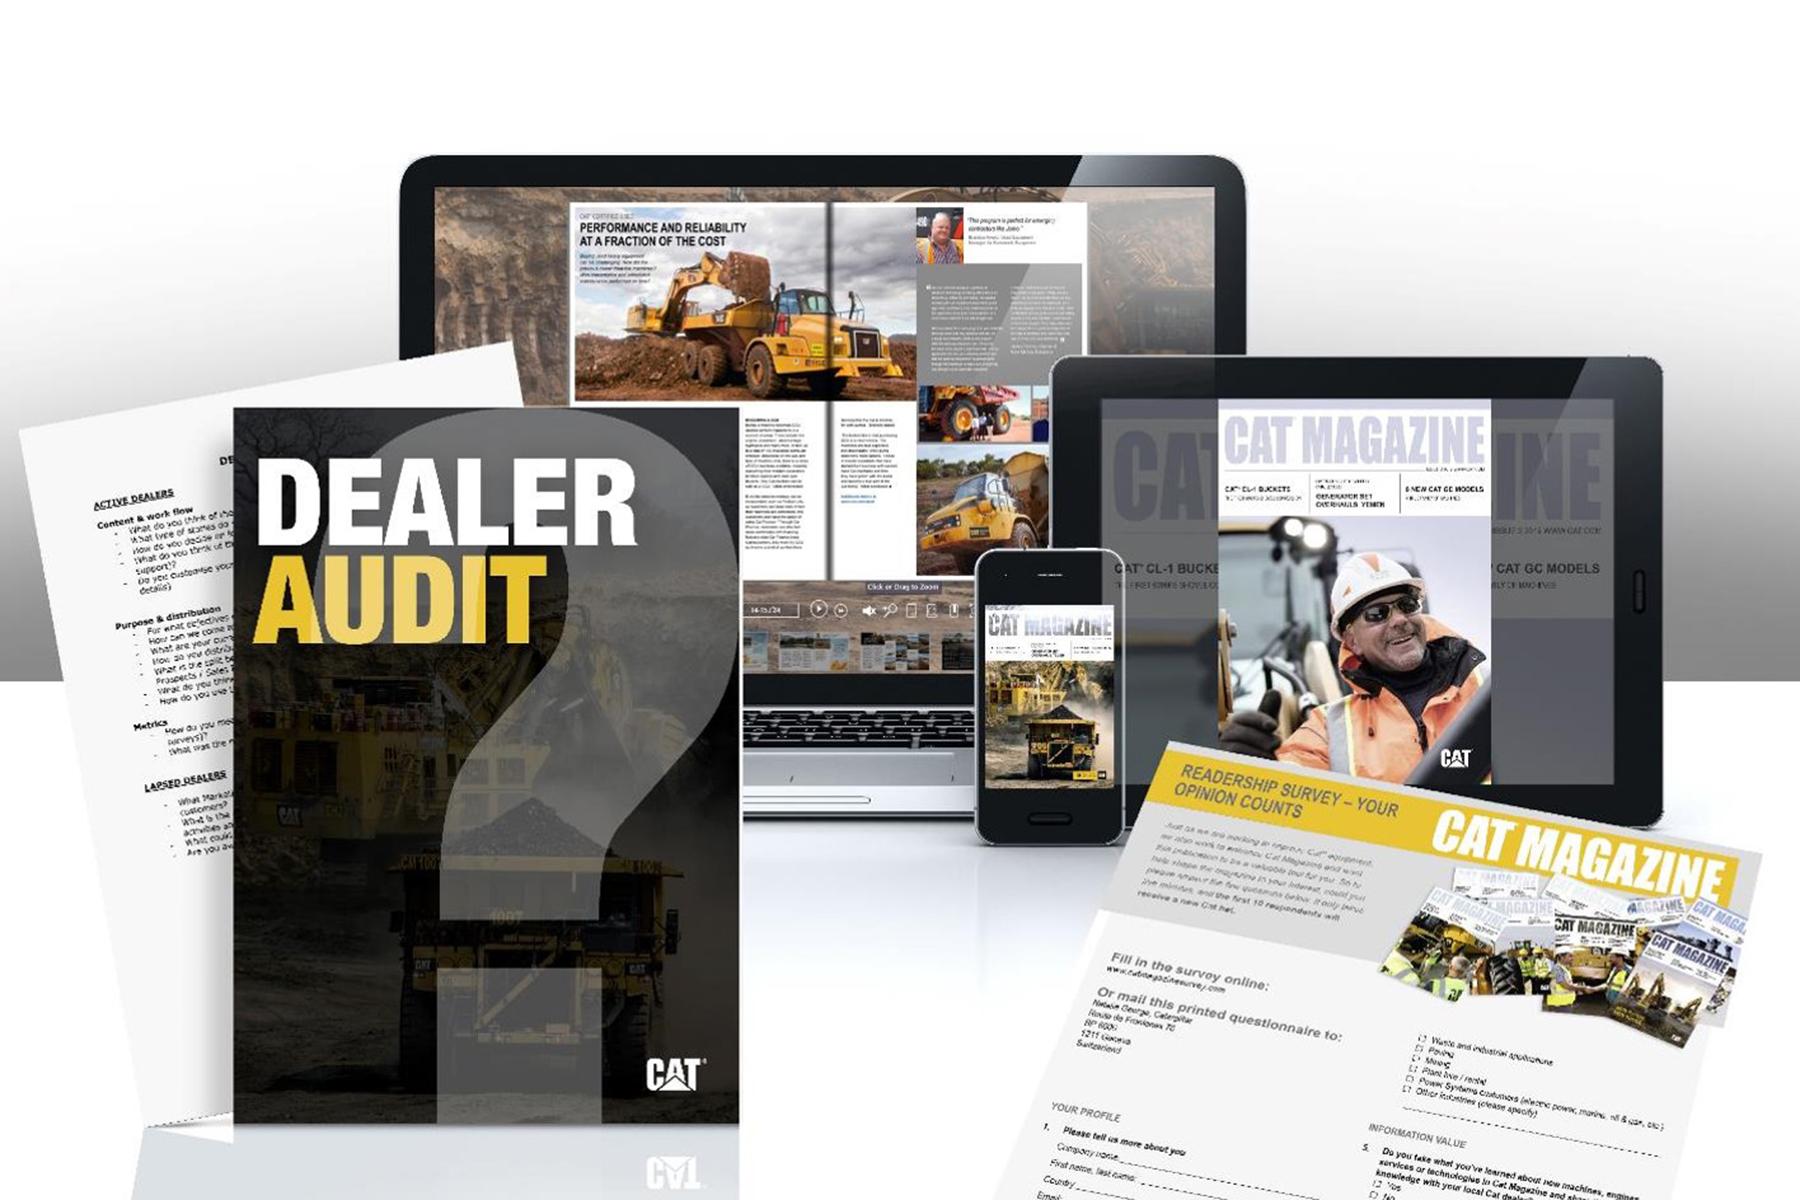 Centigrade - CAT Magazine Reader Survey and Dealer Audit